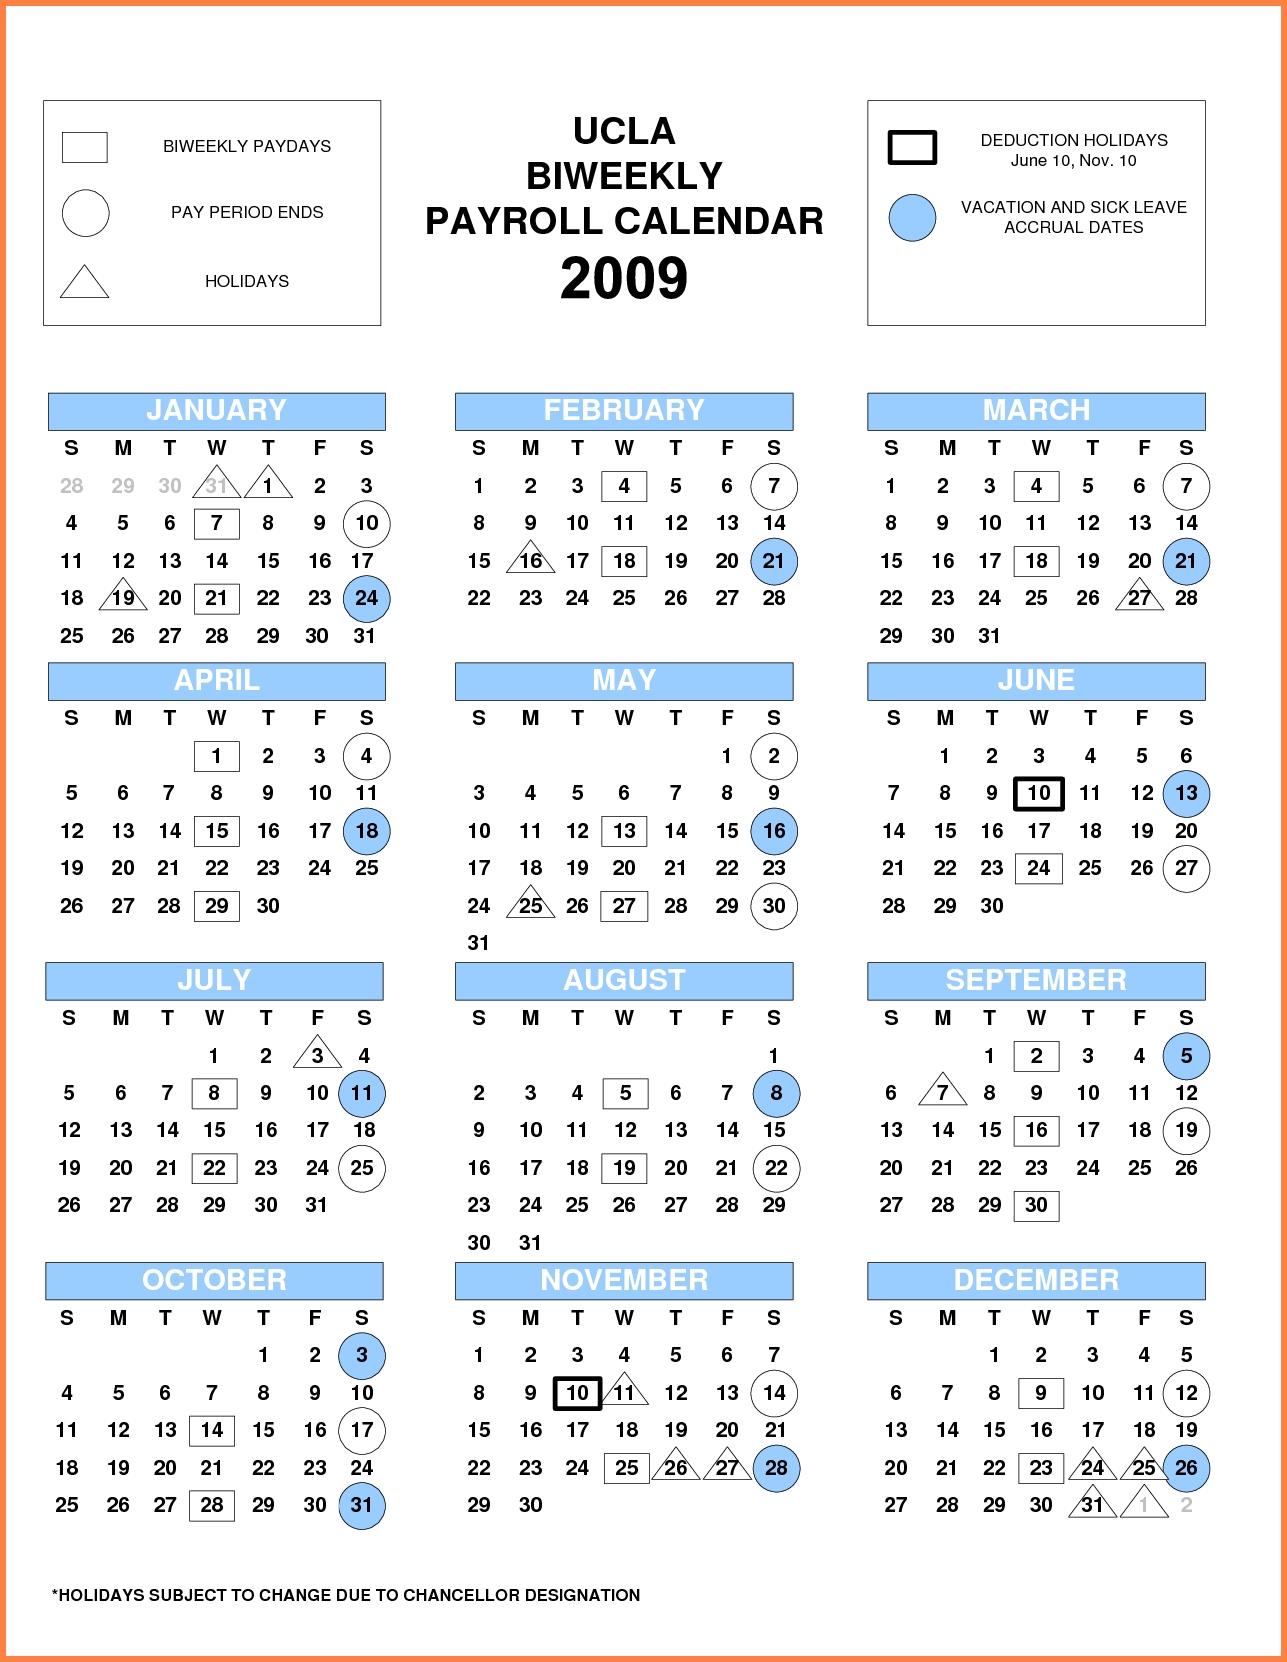 Ucla Biweekly Payroll Calendar 2019 | Payroll Calendars-Biweekly Payroll Calendar 2020 Template